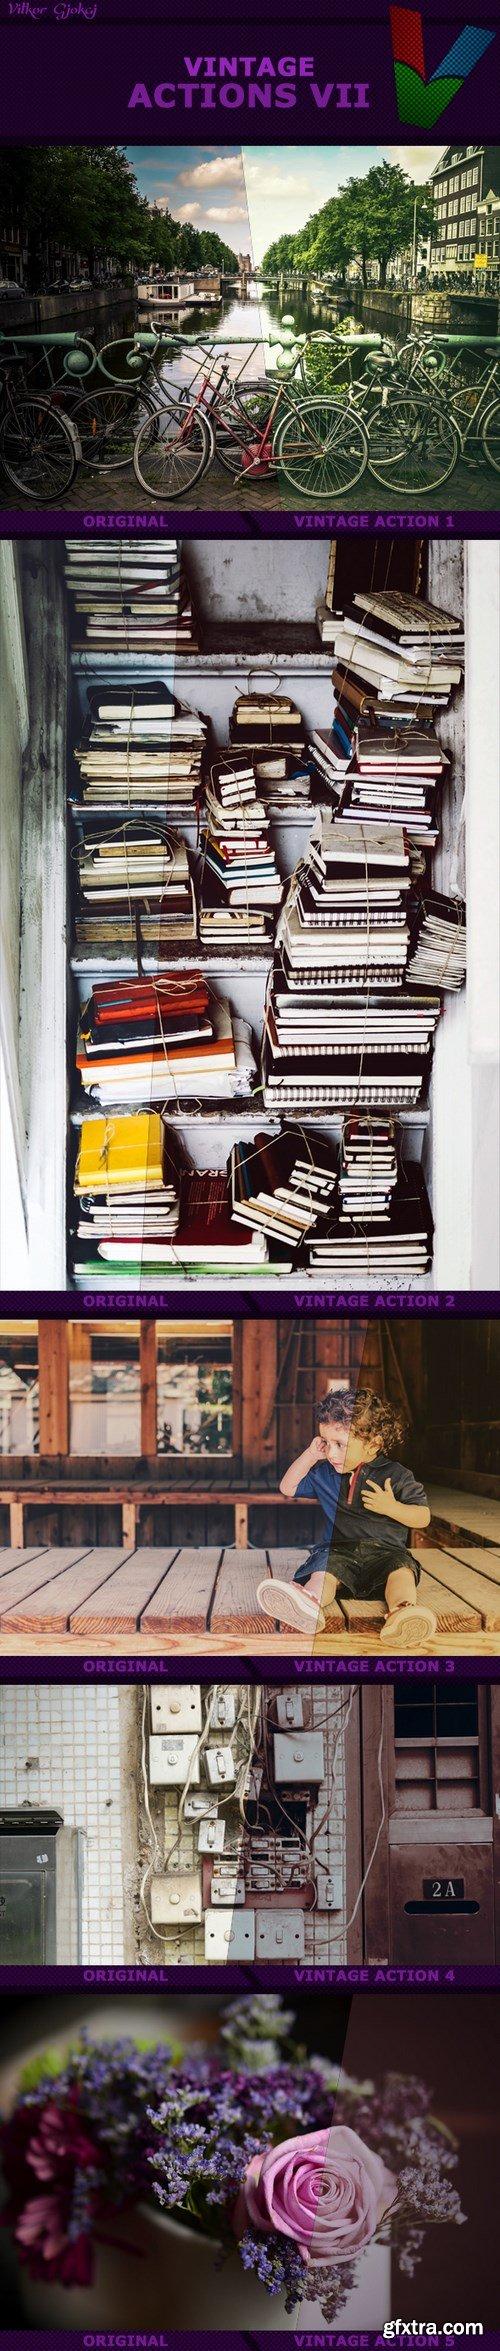 Vintage Actions VII 17119500